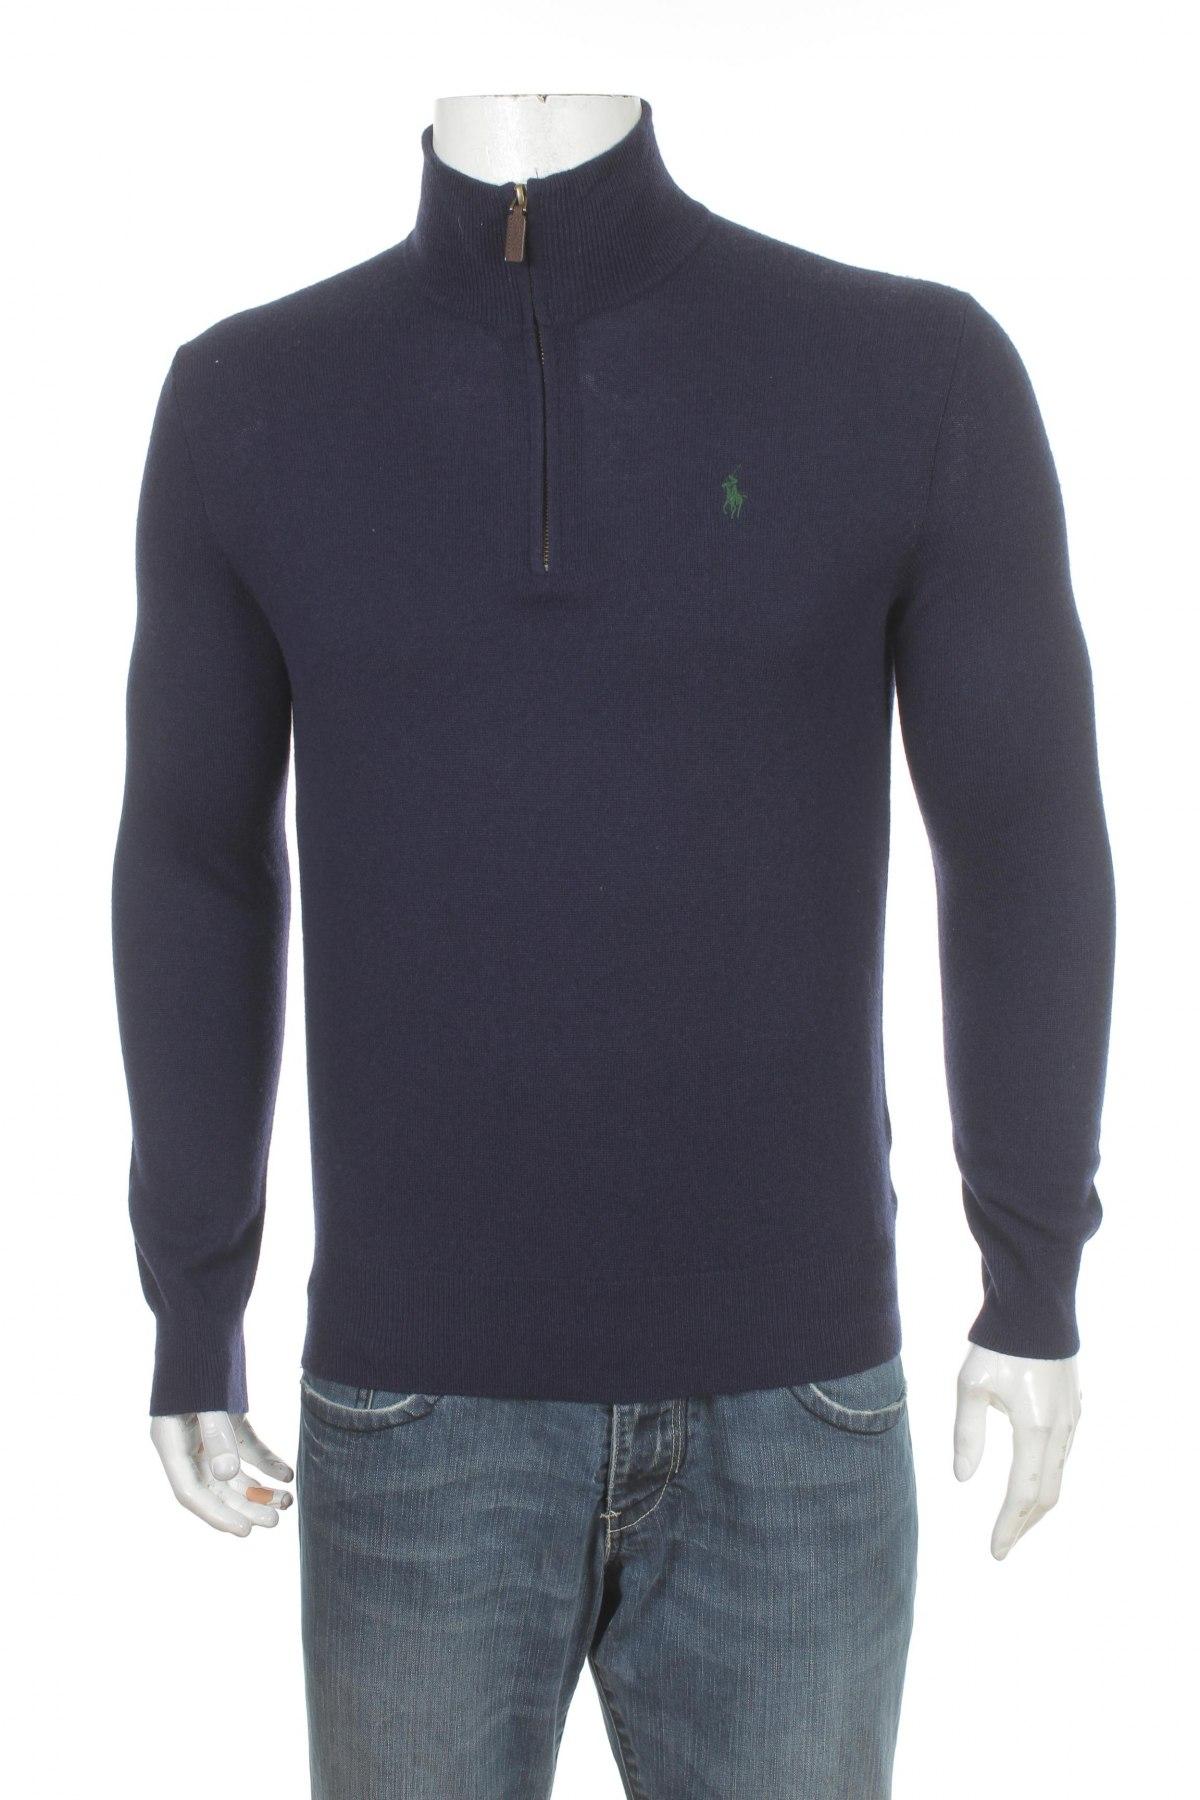 537006a6ad Férfi pulóver Polo By Ralph Lauren - kedvező áron Remixben - #100012166